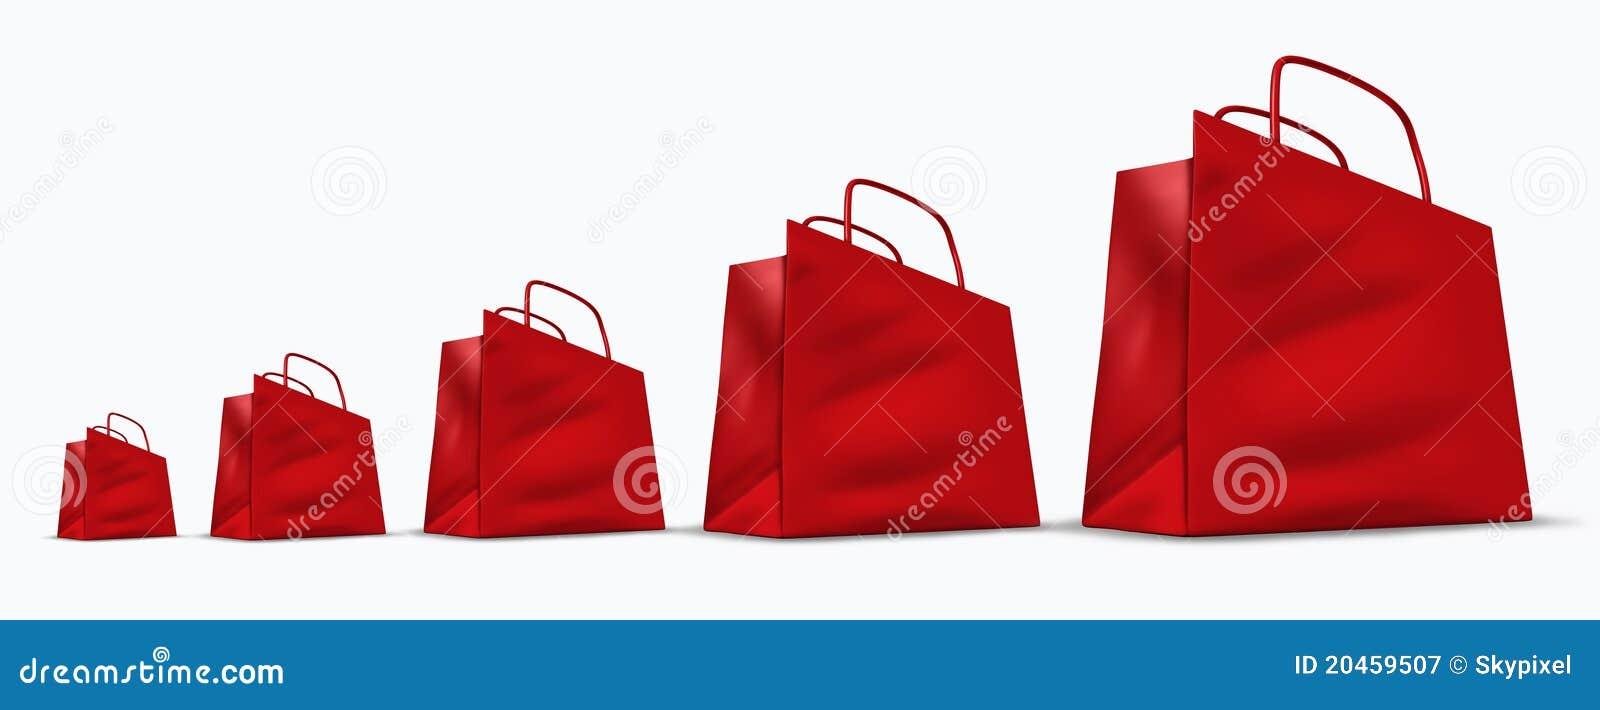 Carta das vendas de varejo